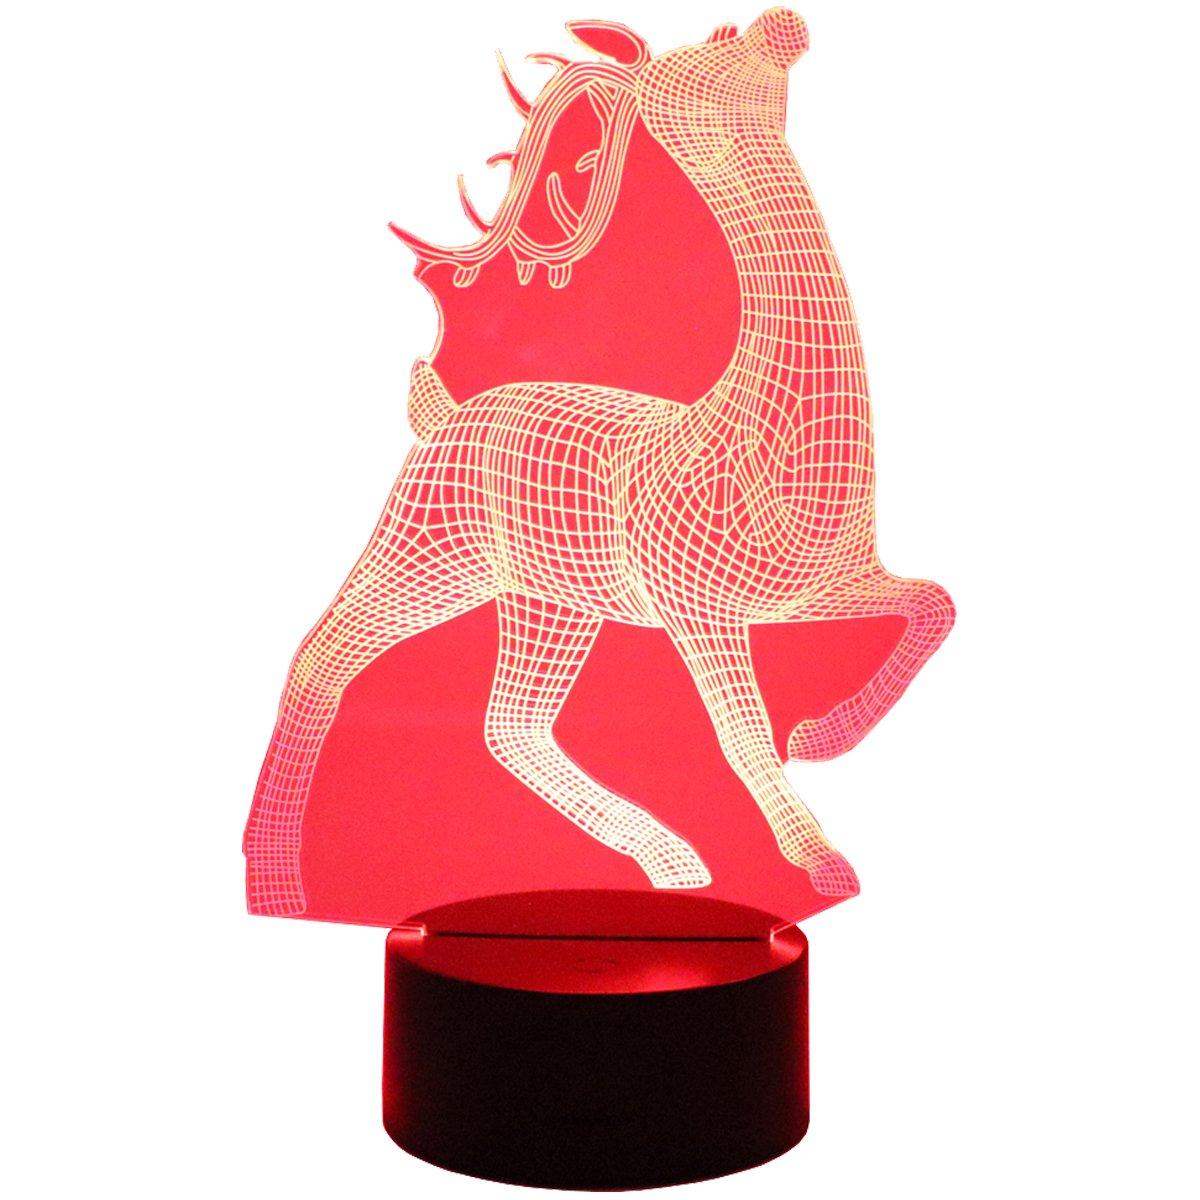 hguangs 3dランプ鹿形状夜ランプ3d Optical Illusionナイトライトデスクテーブルライト7色変更タッチコントロールギフトforクリスマス誕生日バレンタインの日キッズ子供女の子と男の子 B07B62FLKW 14906